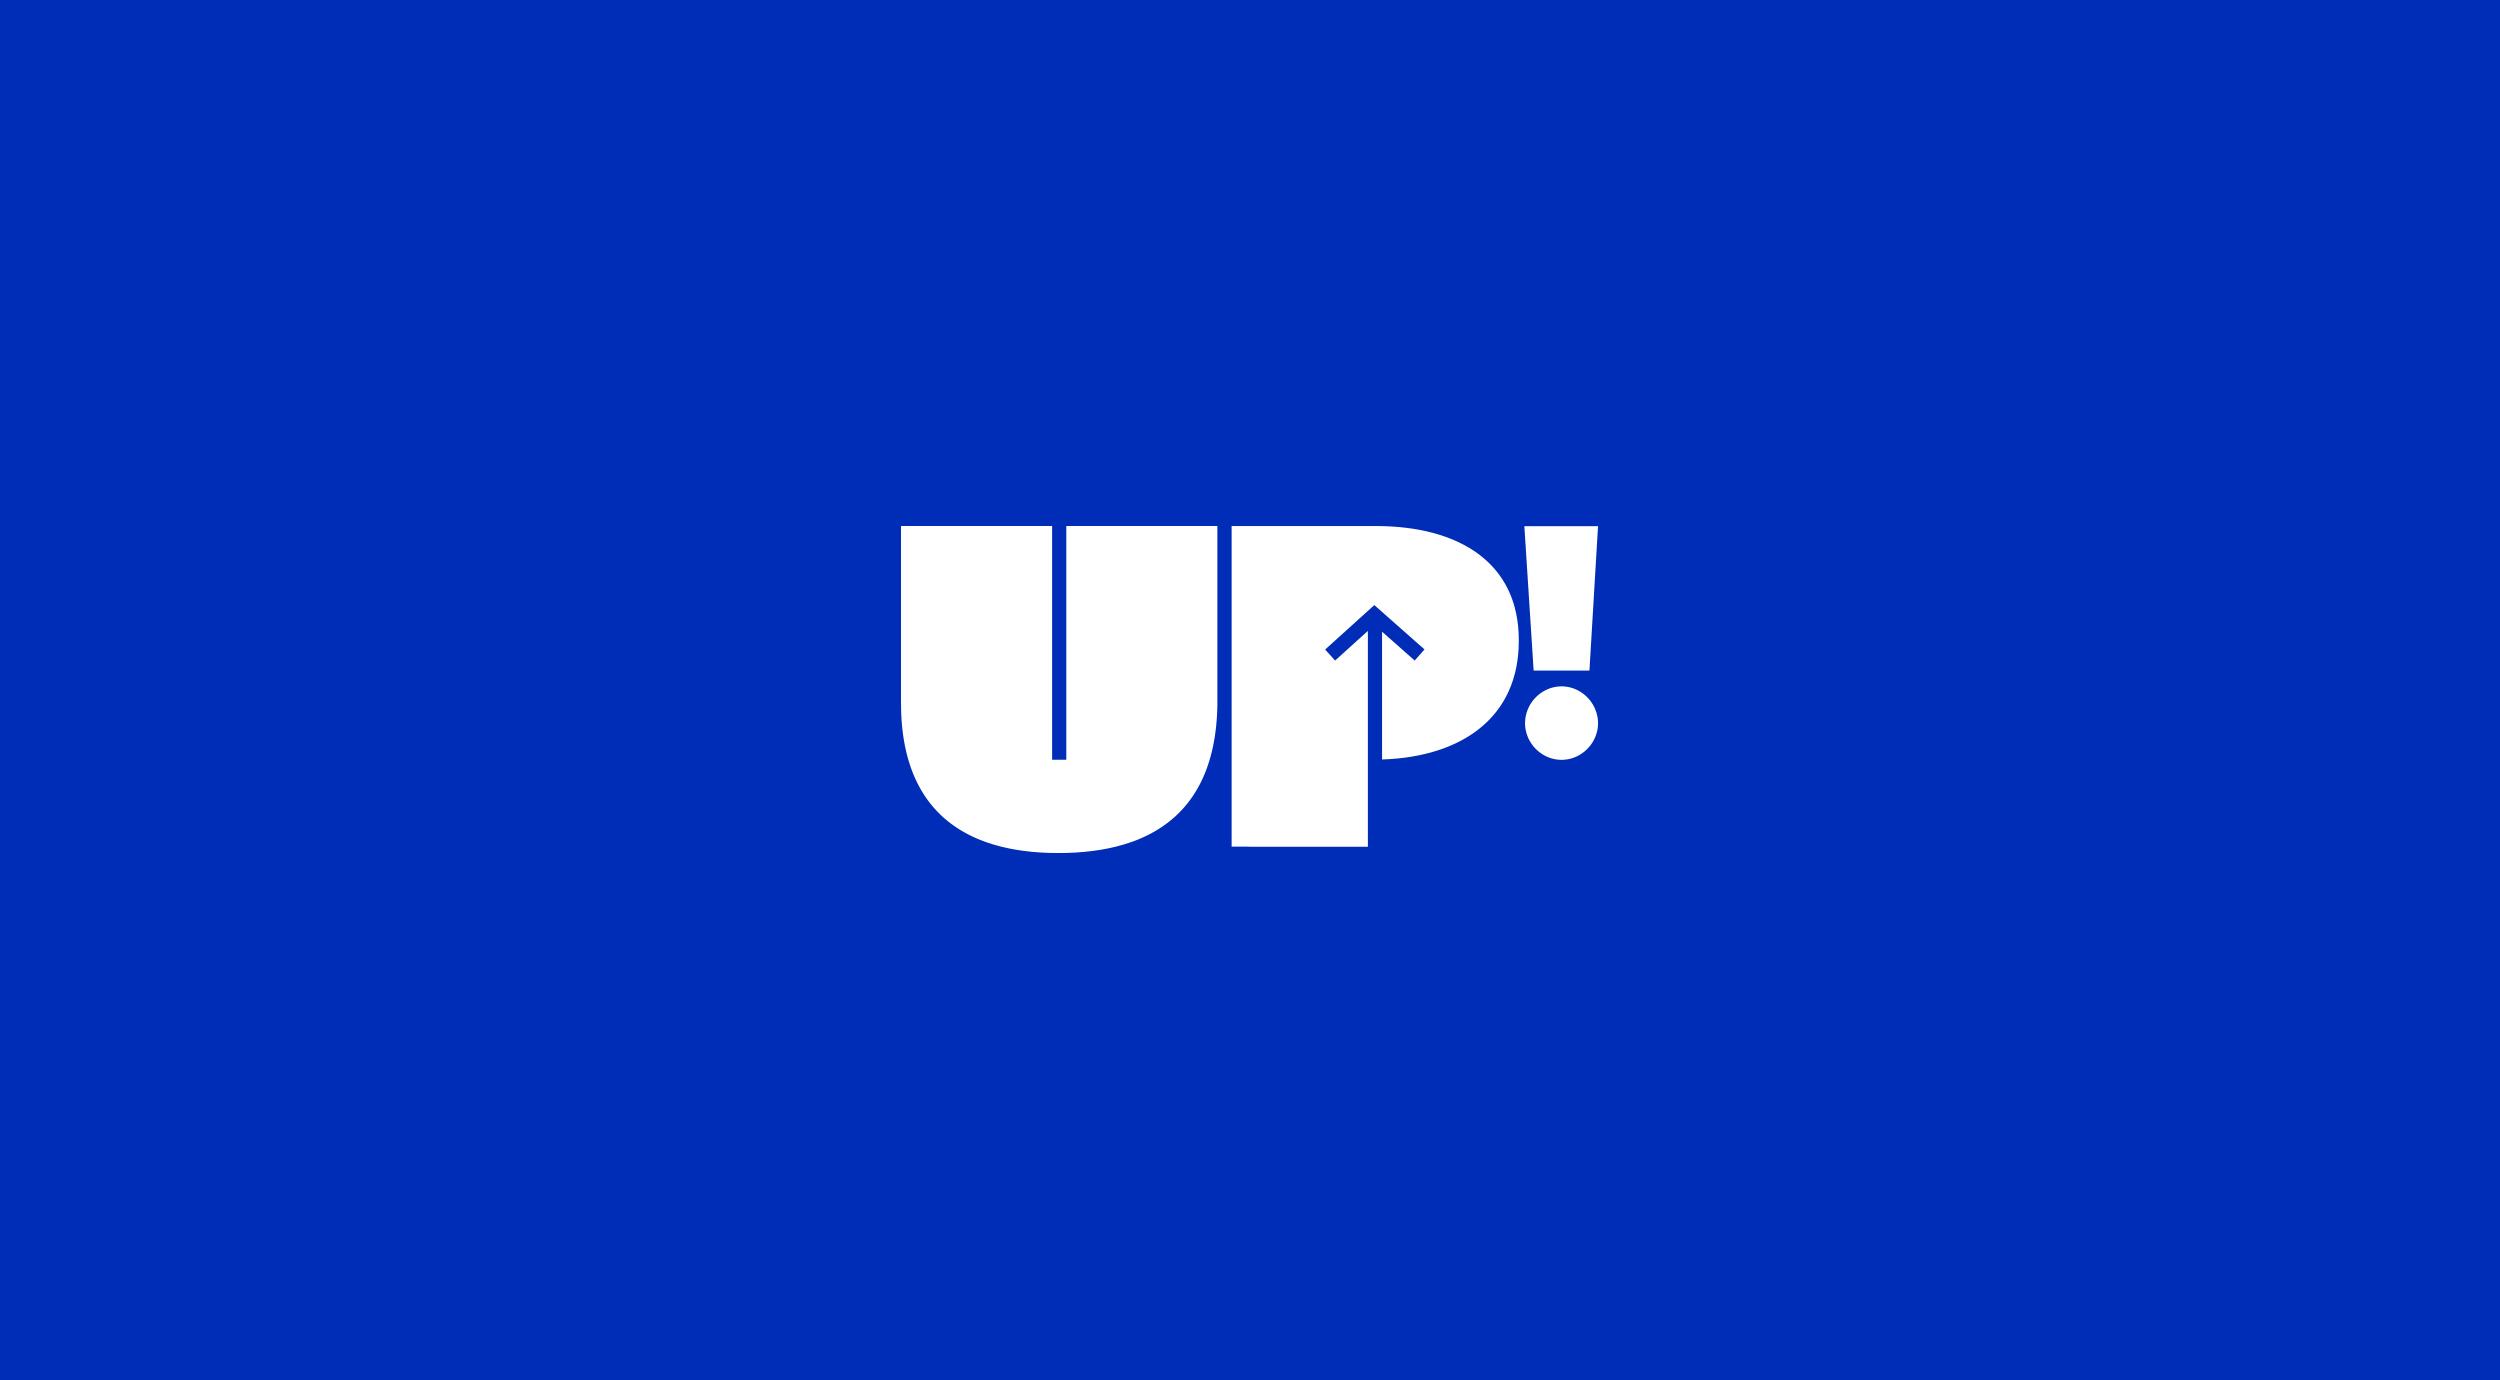 UP! Blue.jpg